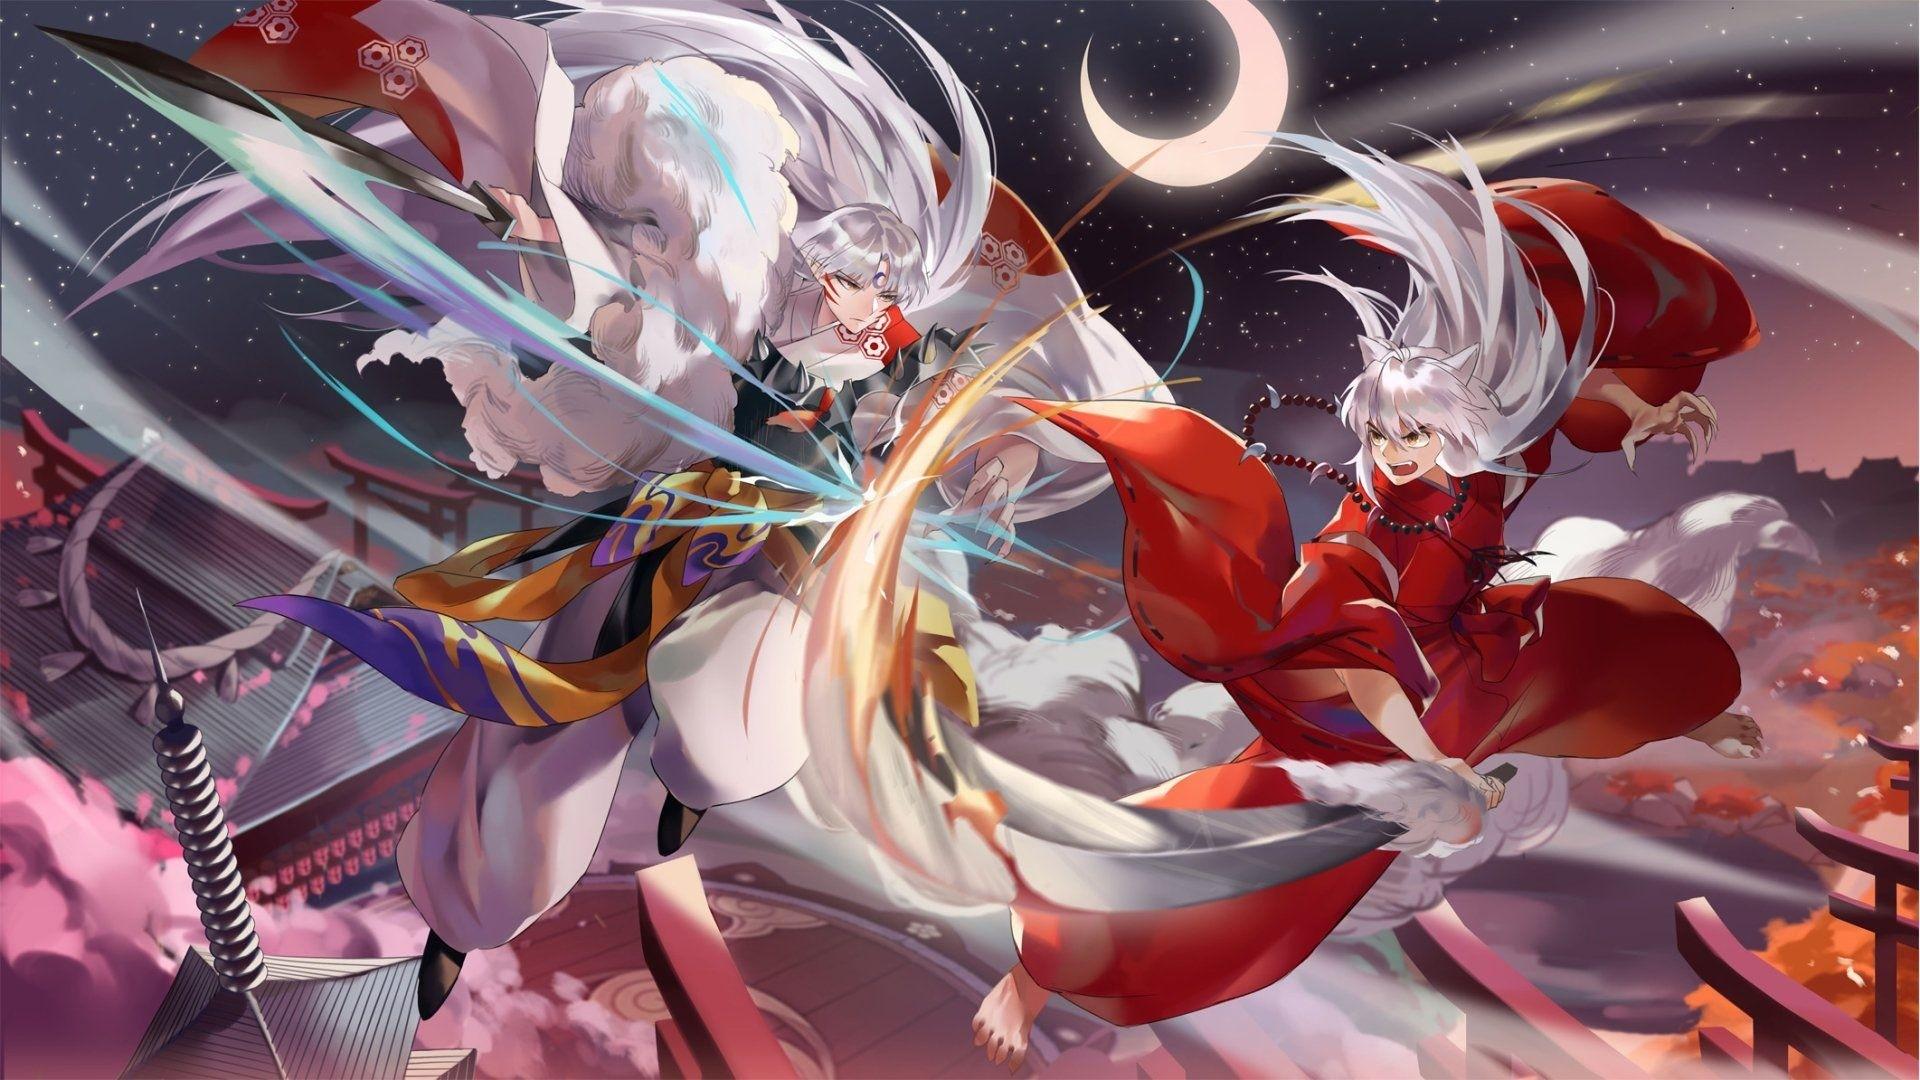 Inuyasha hd desktop wallpaper